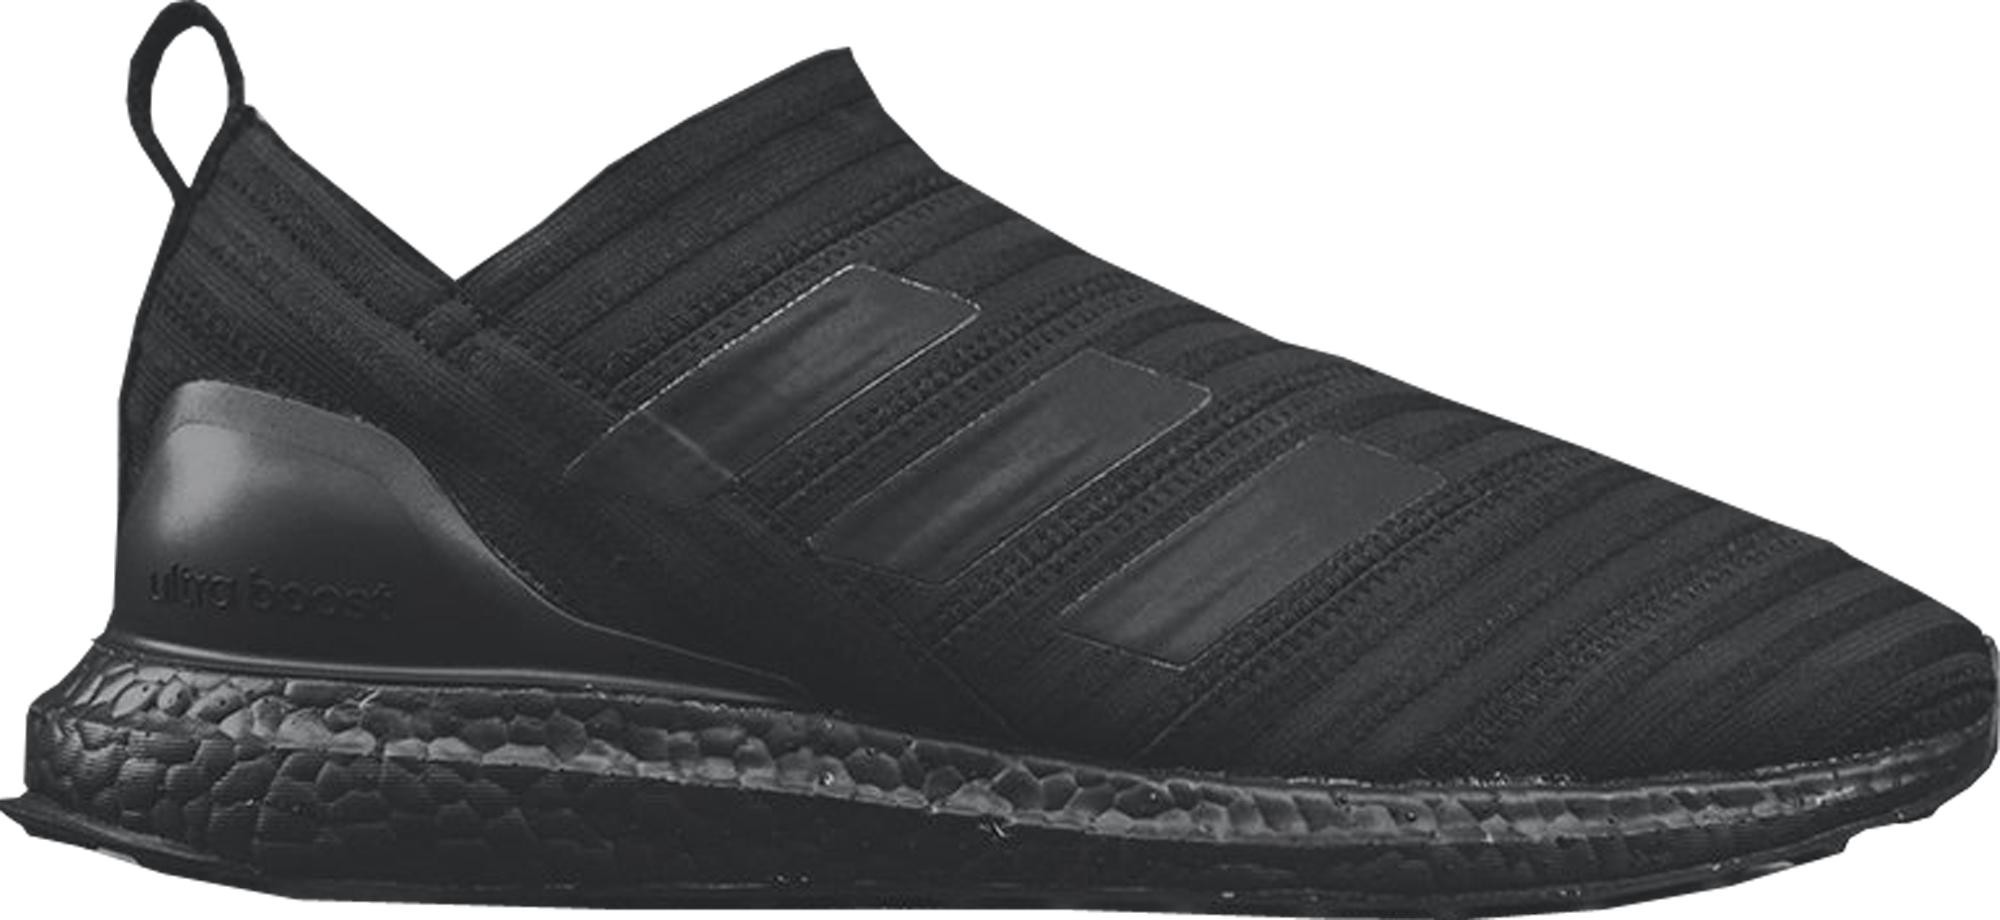 adidas Nemeziz Tango 17 Ultra Boost Kith Cobras